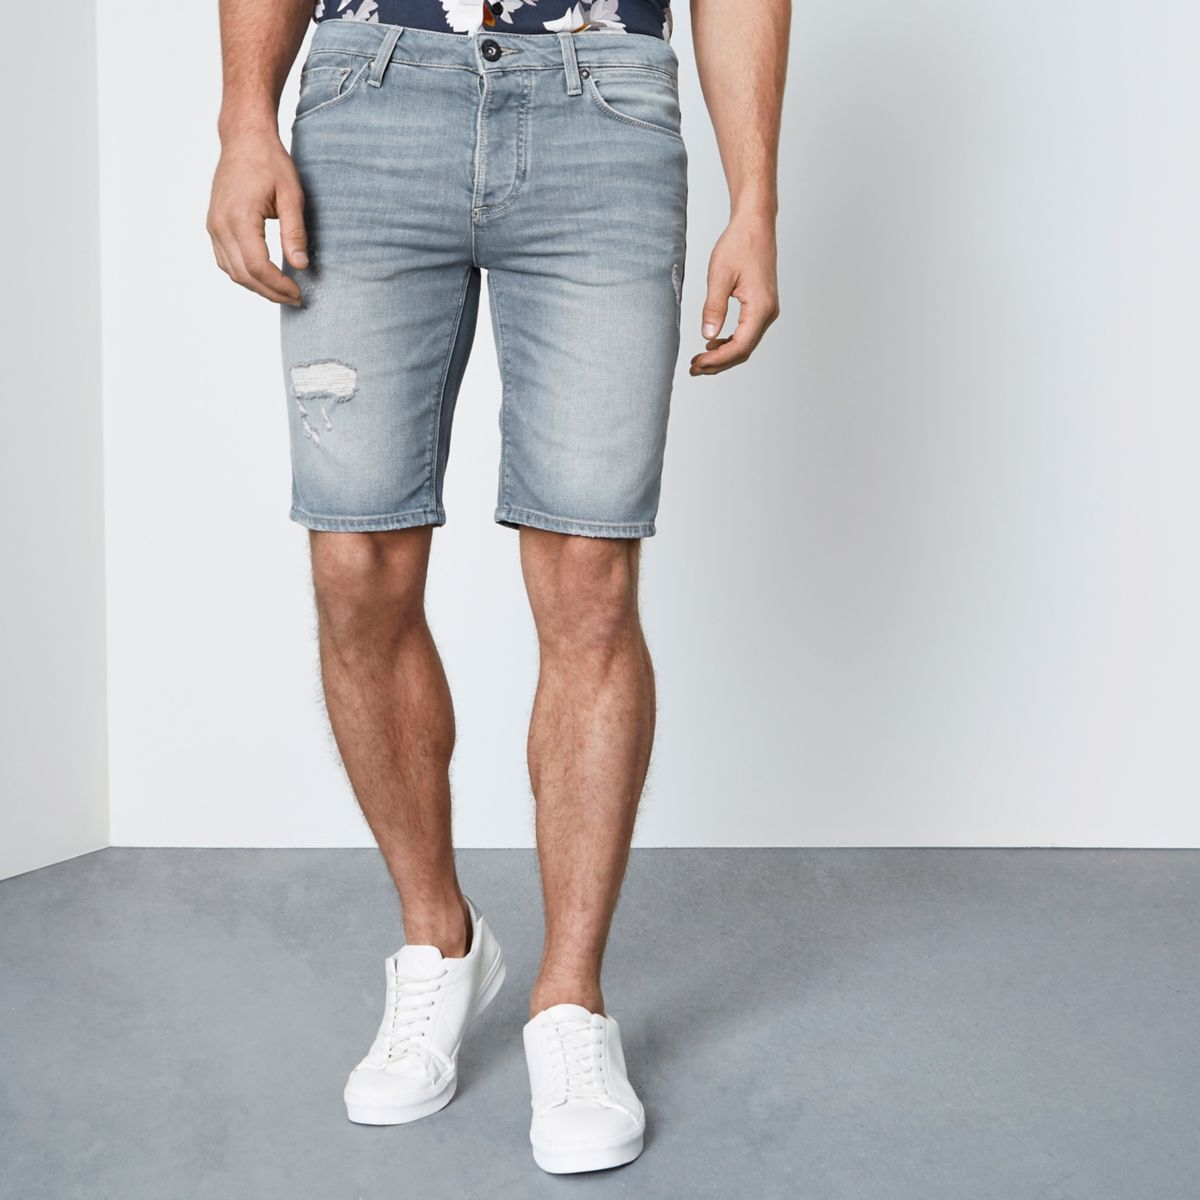 Ice grey wash skinny fit denim shorts